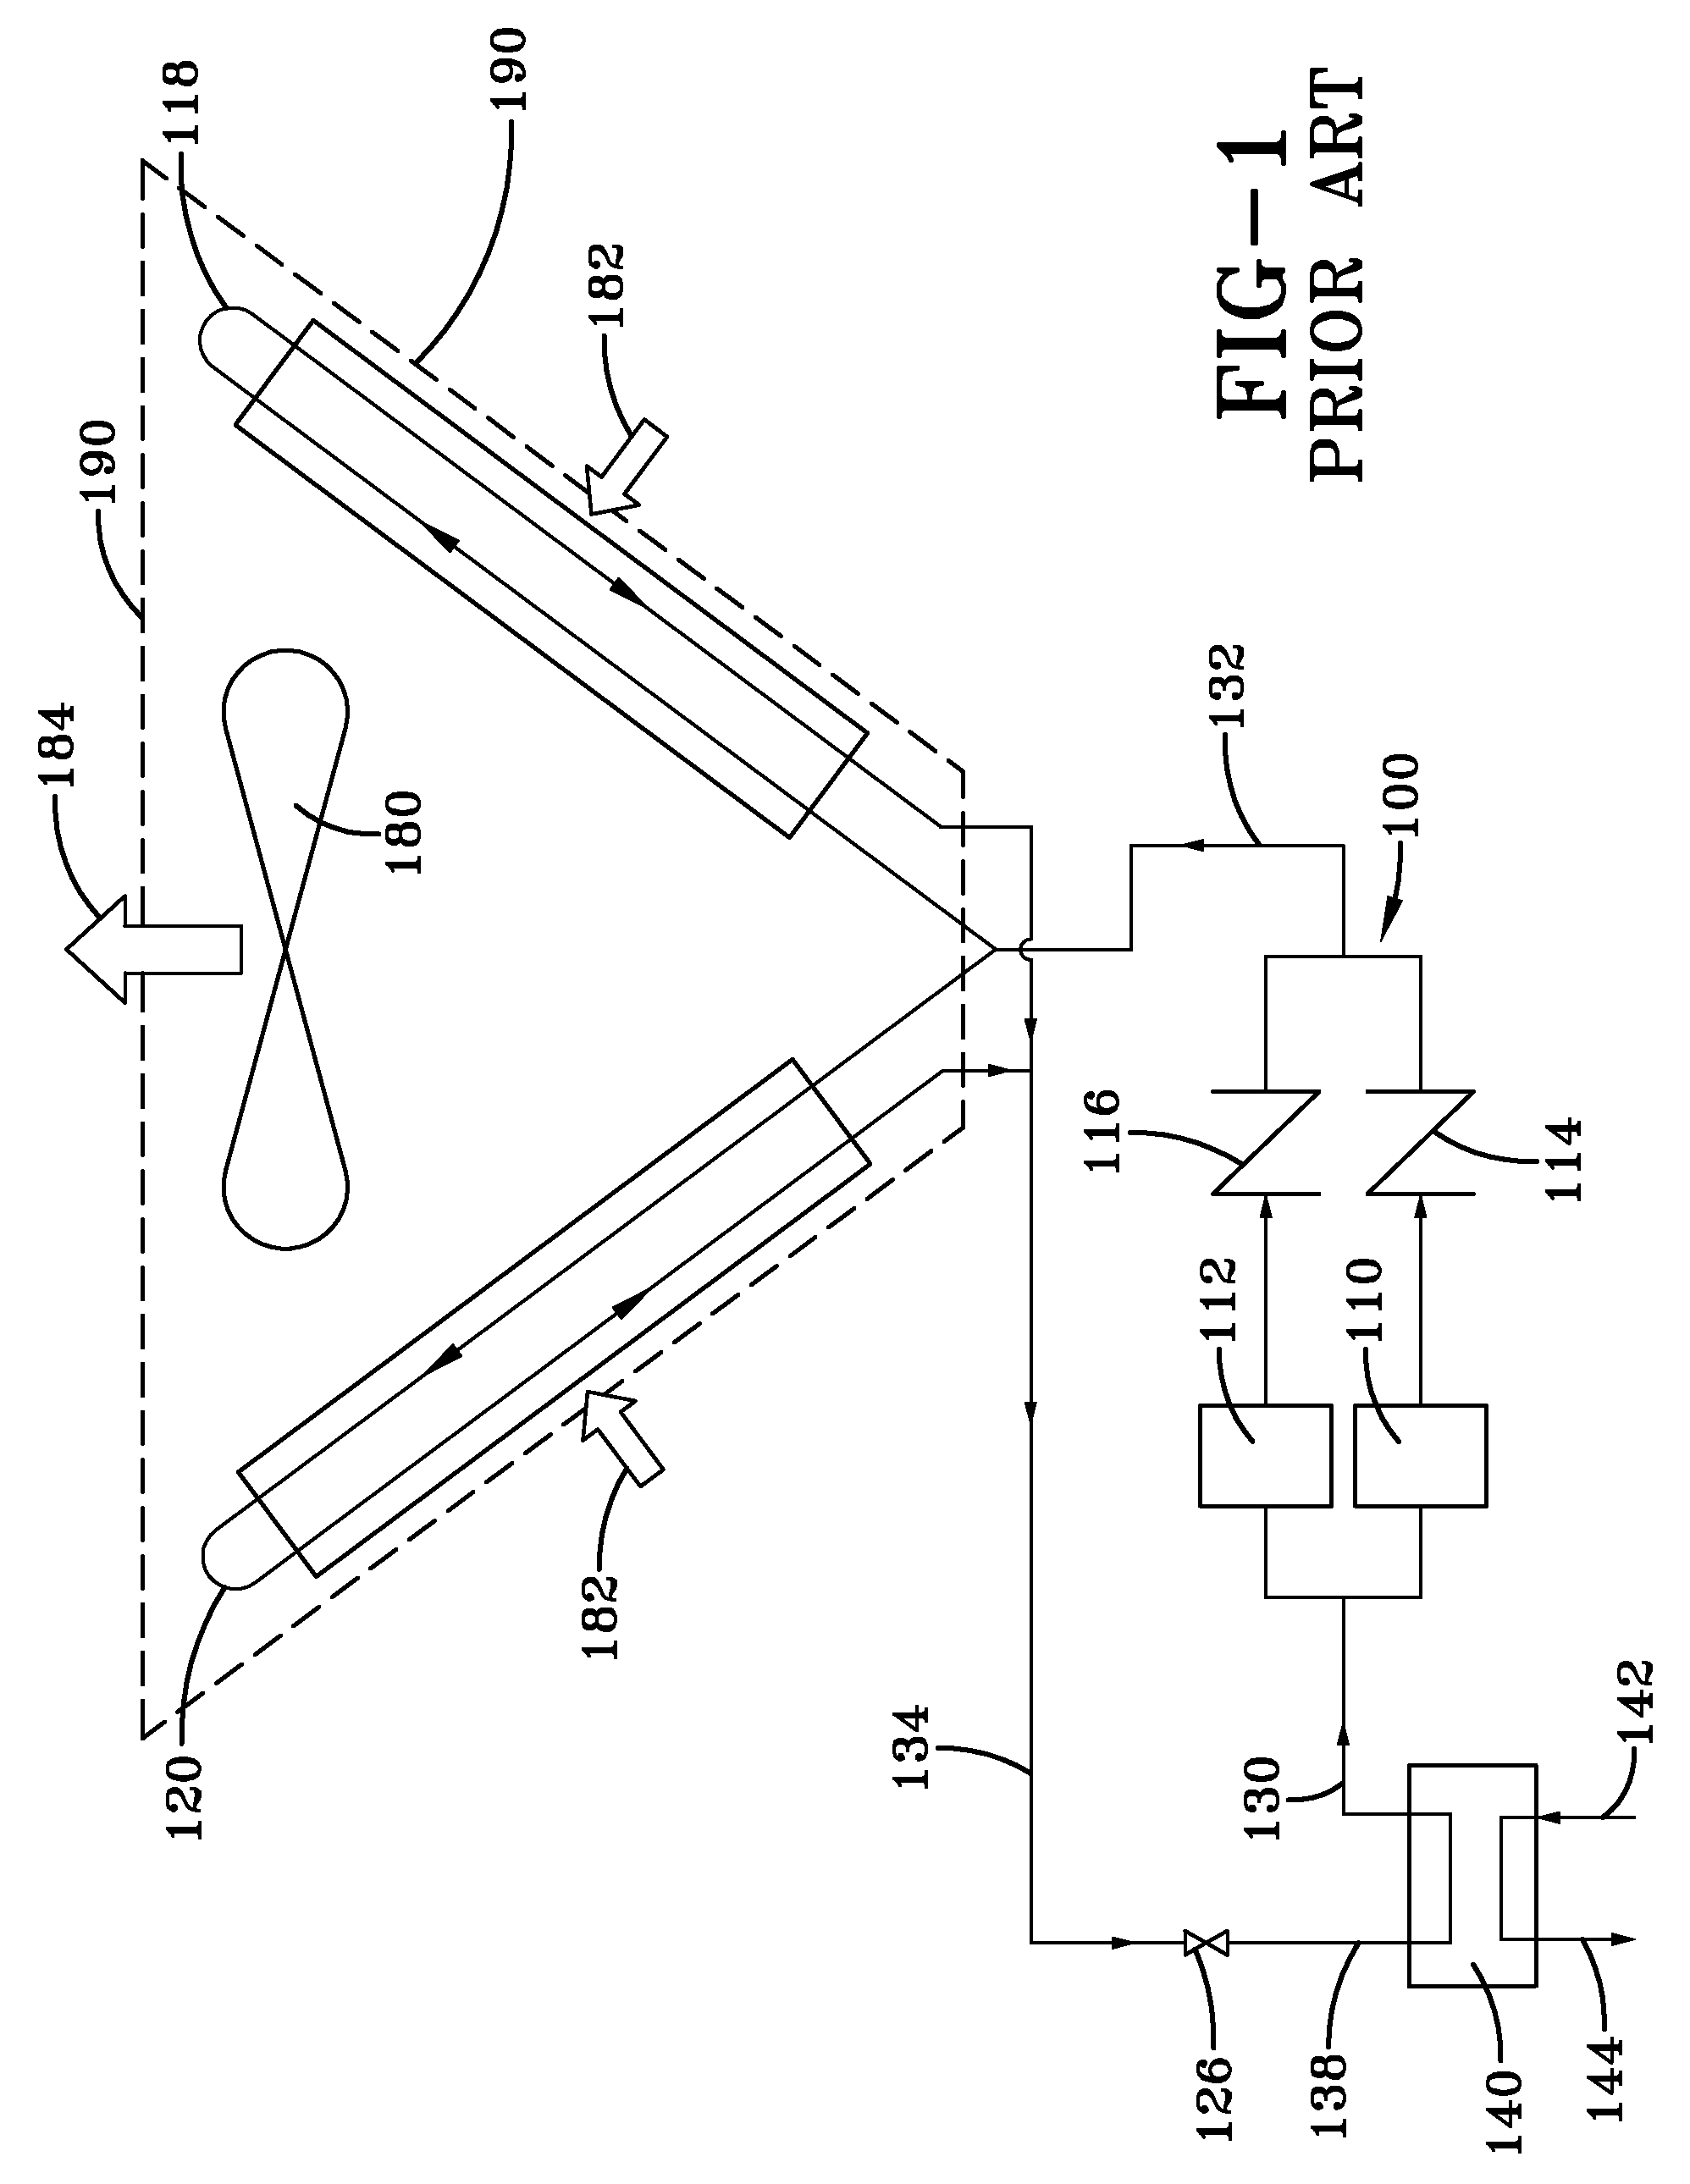 closed loop cooling system design